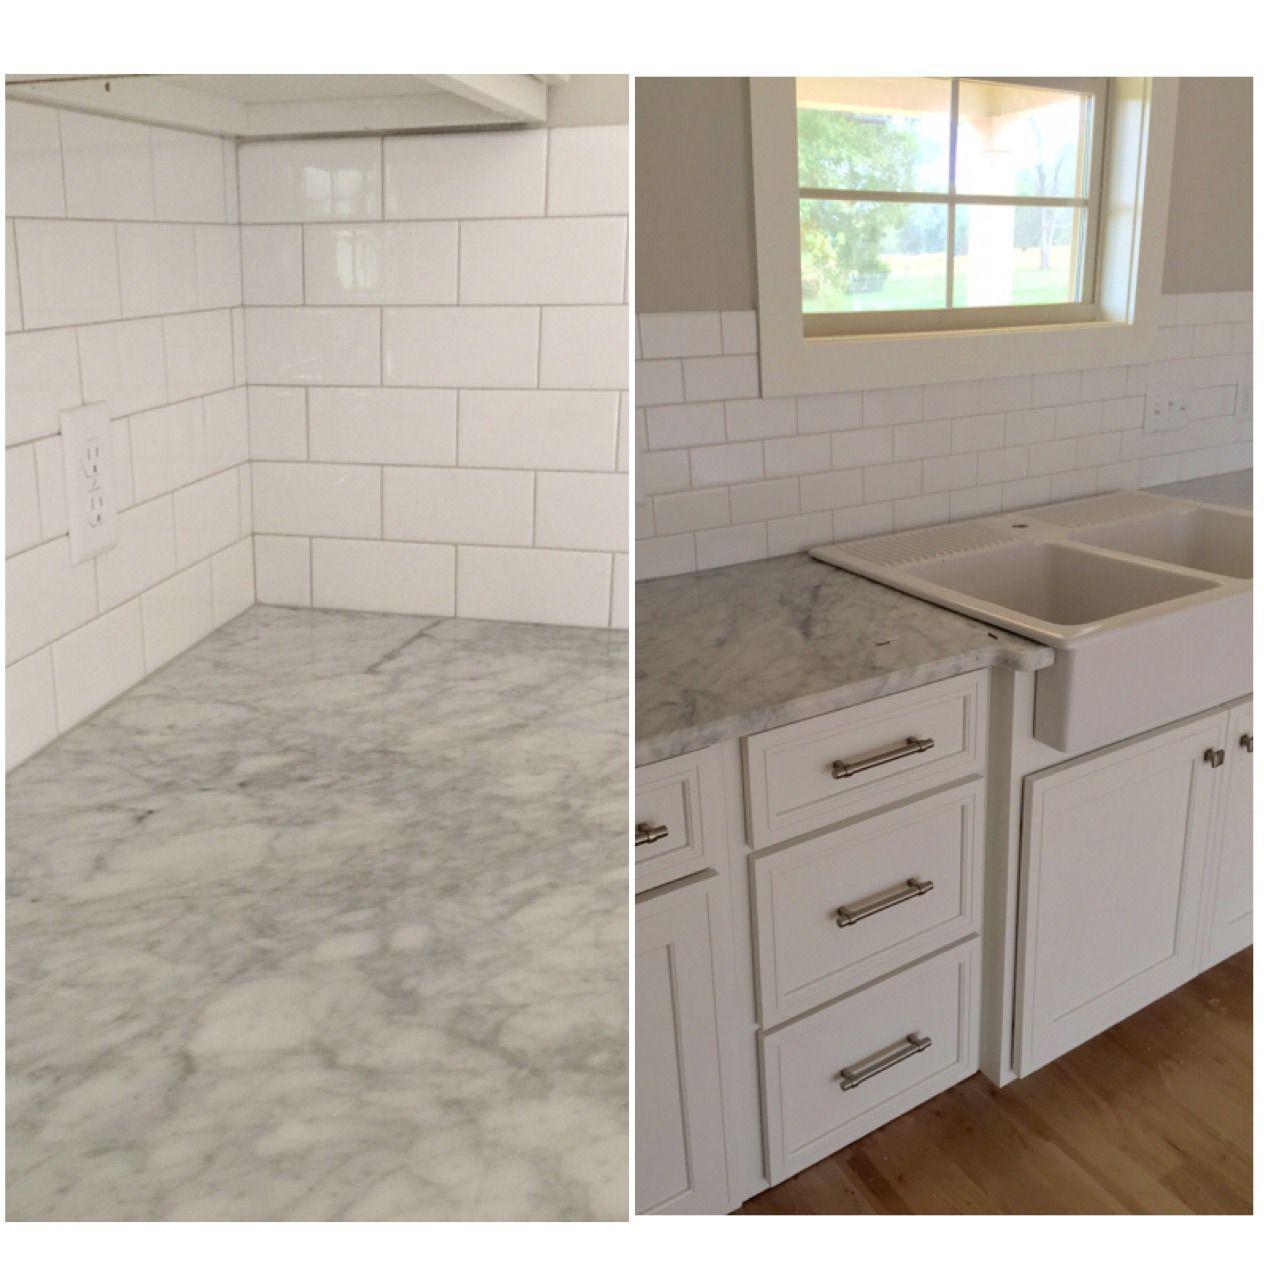 Subway tile with white Carrara countertops and IKEA domsjo